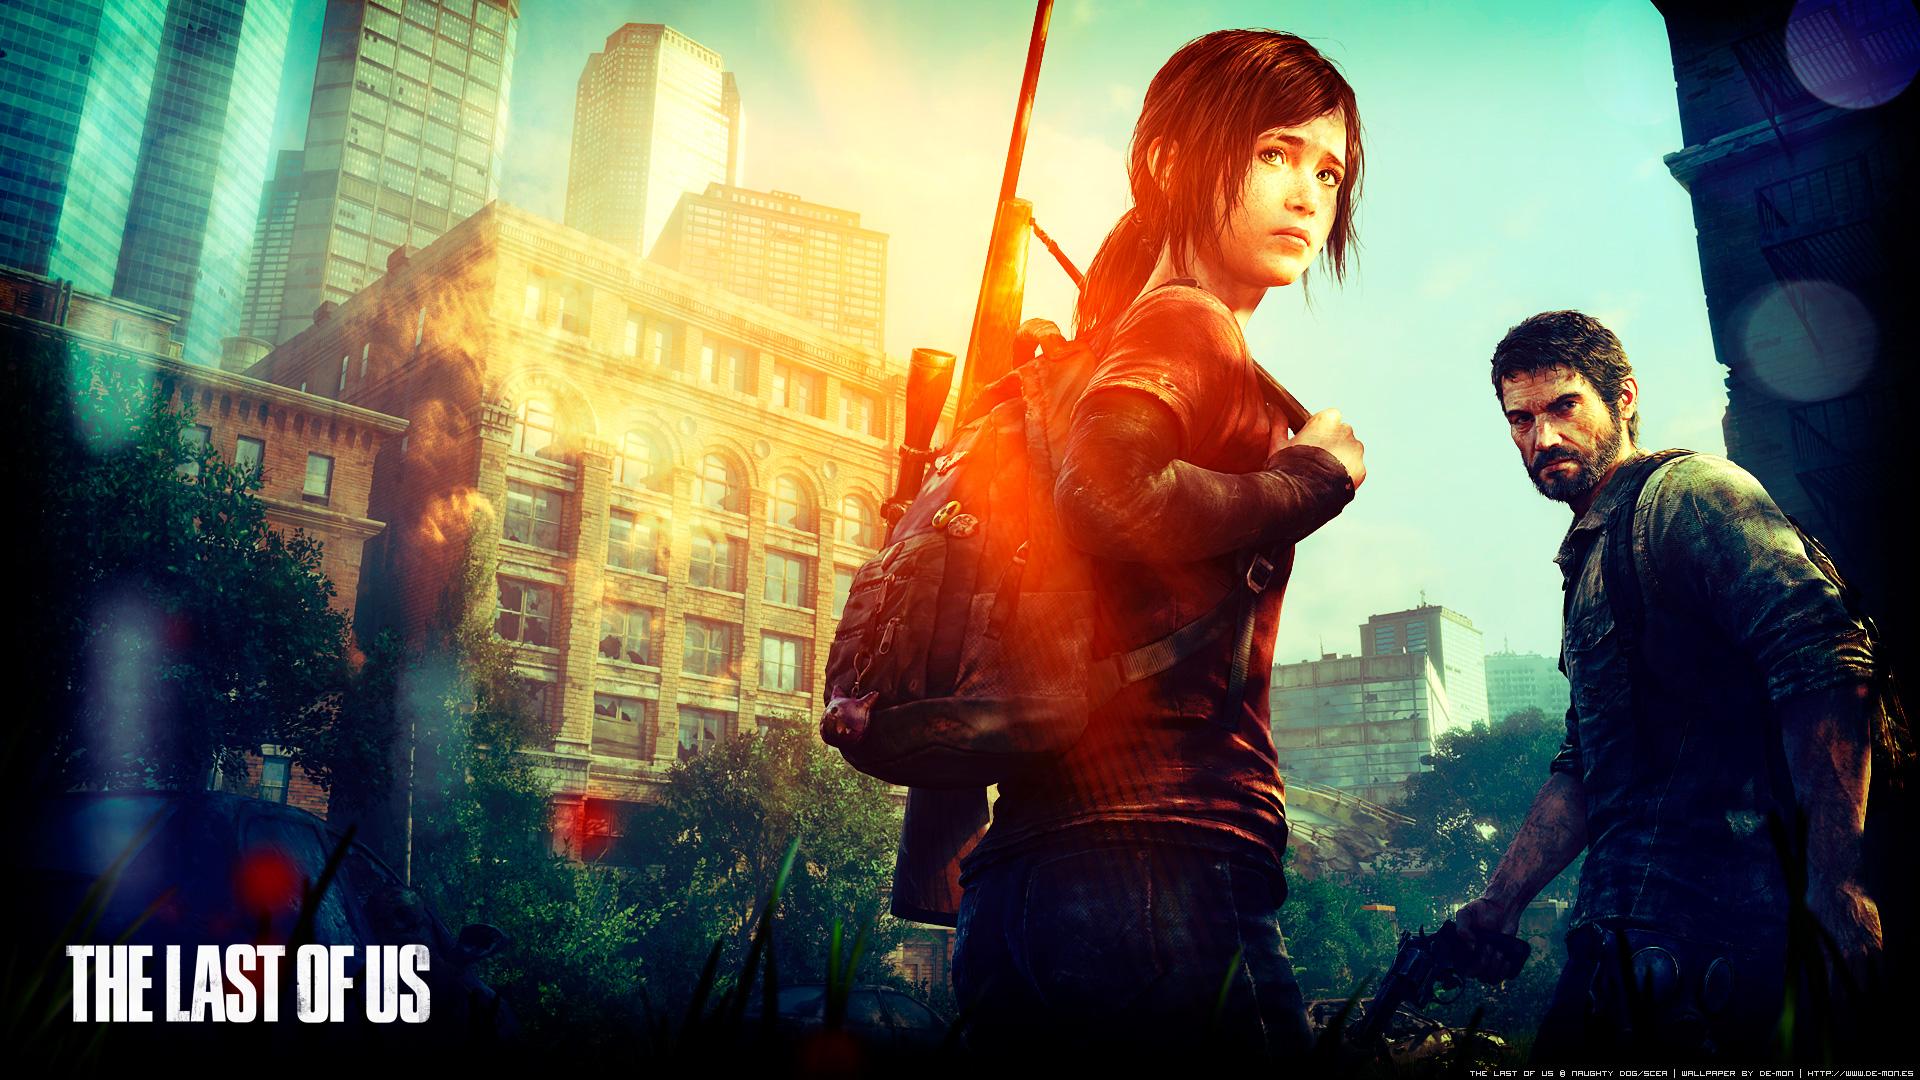 The Last of Us 1080p Wallpaper 1920x1080